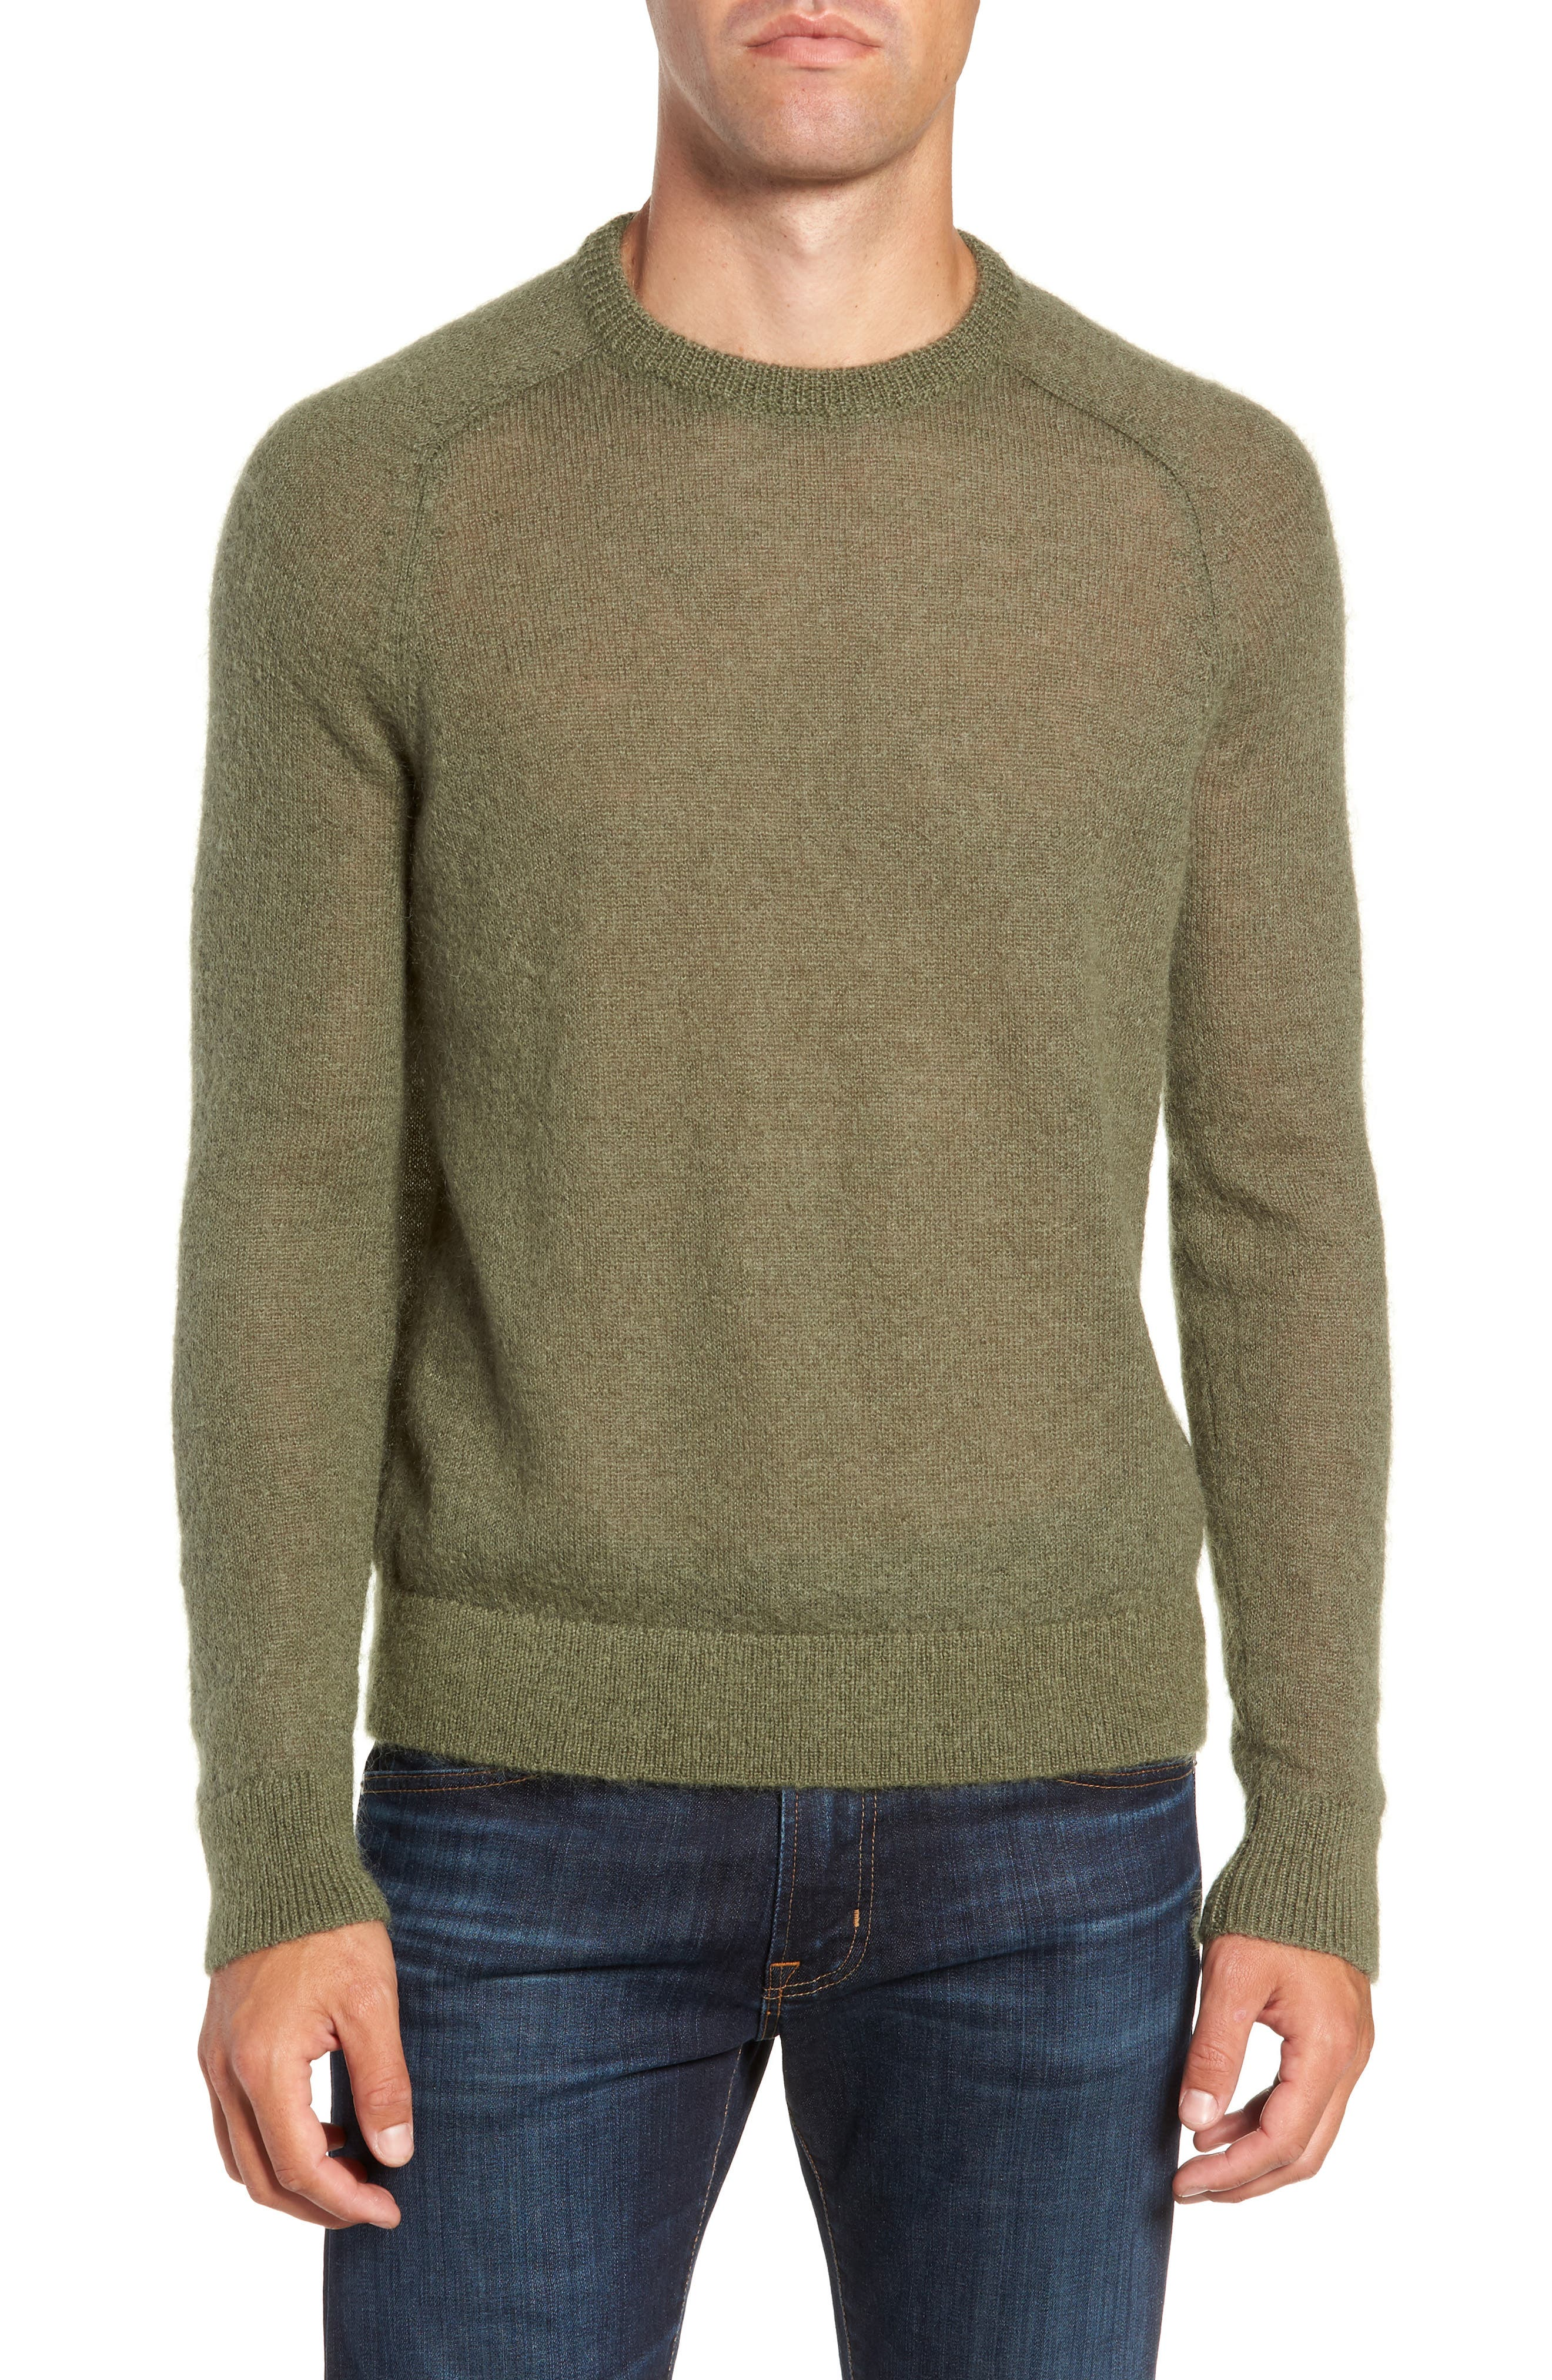 Mohair Blend Crewneck Sweater,                             Main thumbnail 1, color,                             340